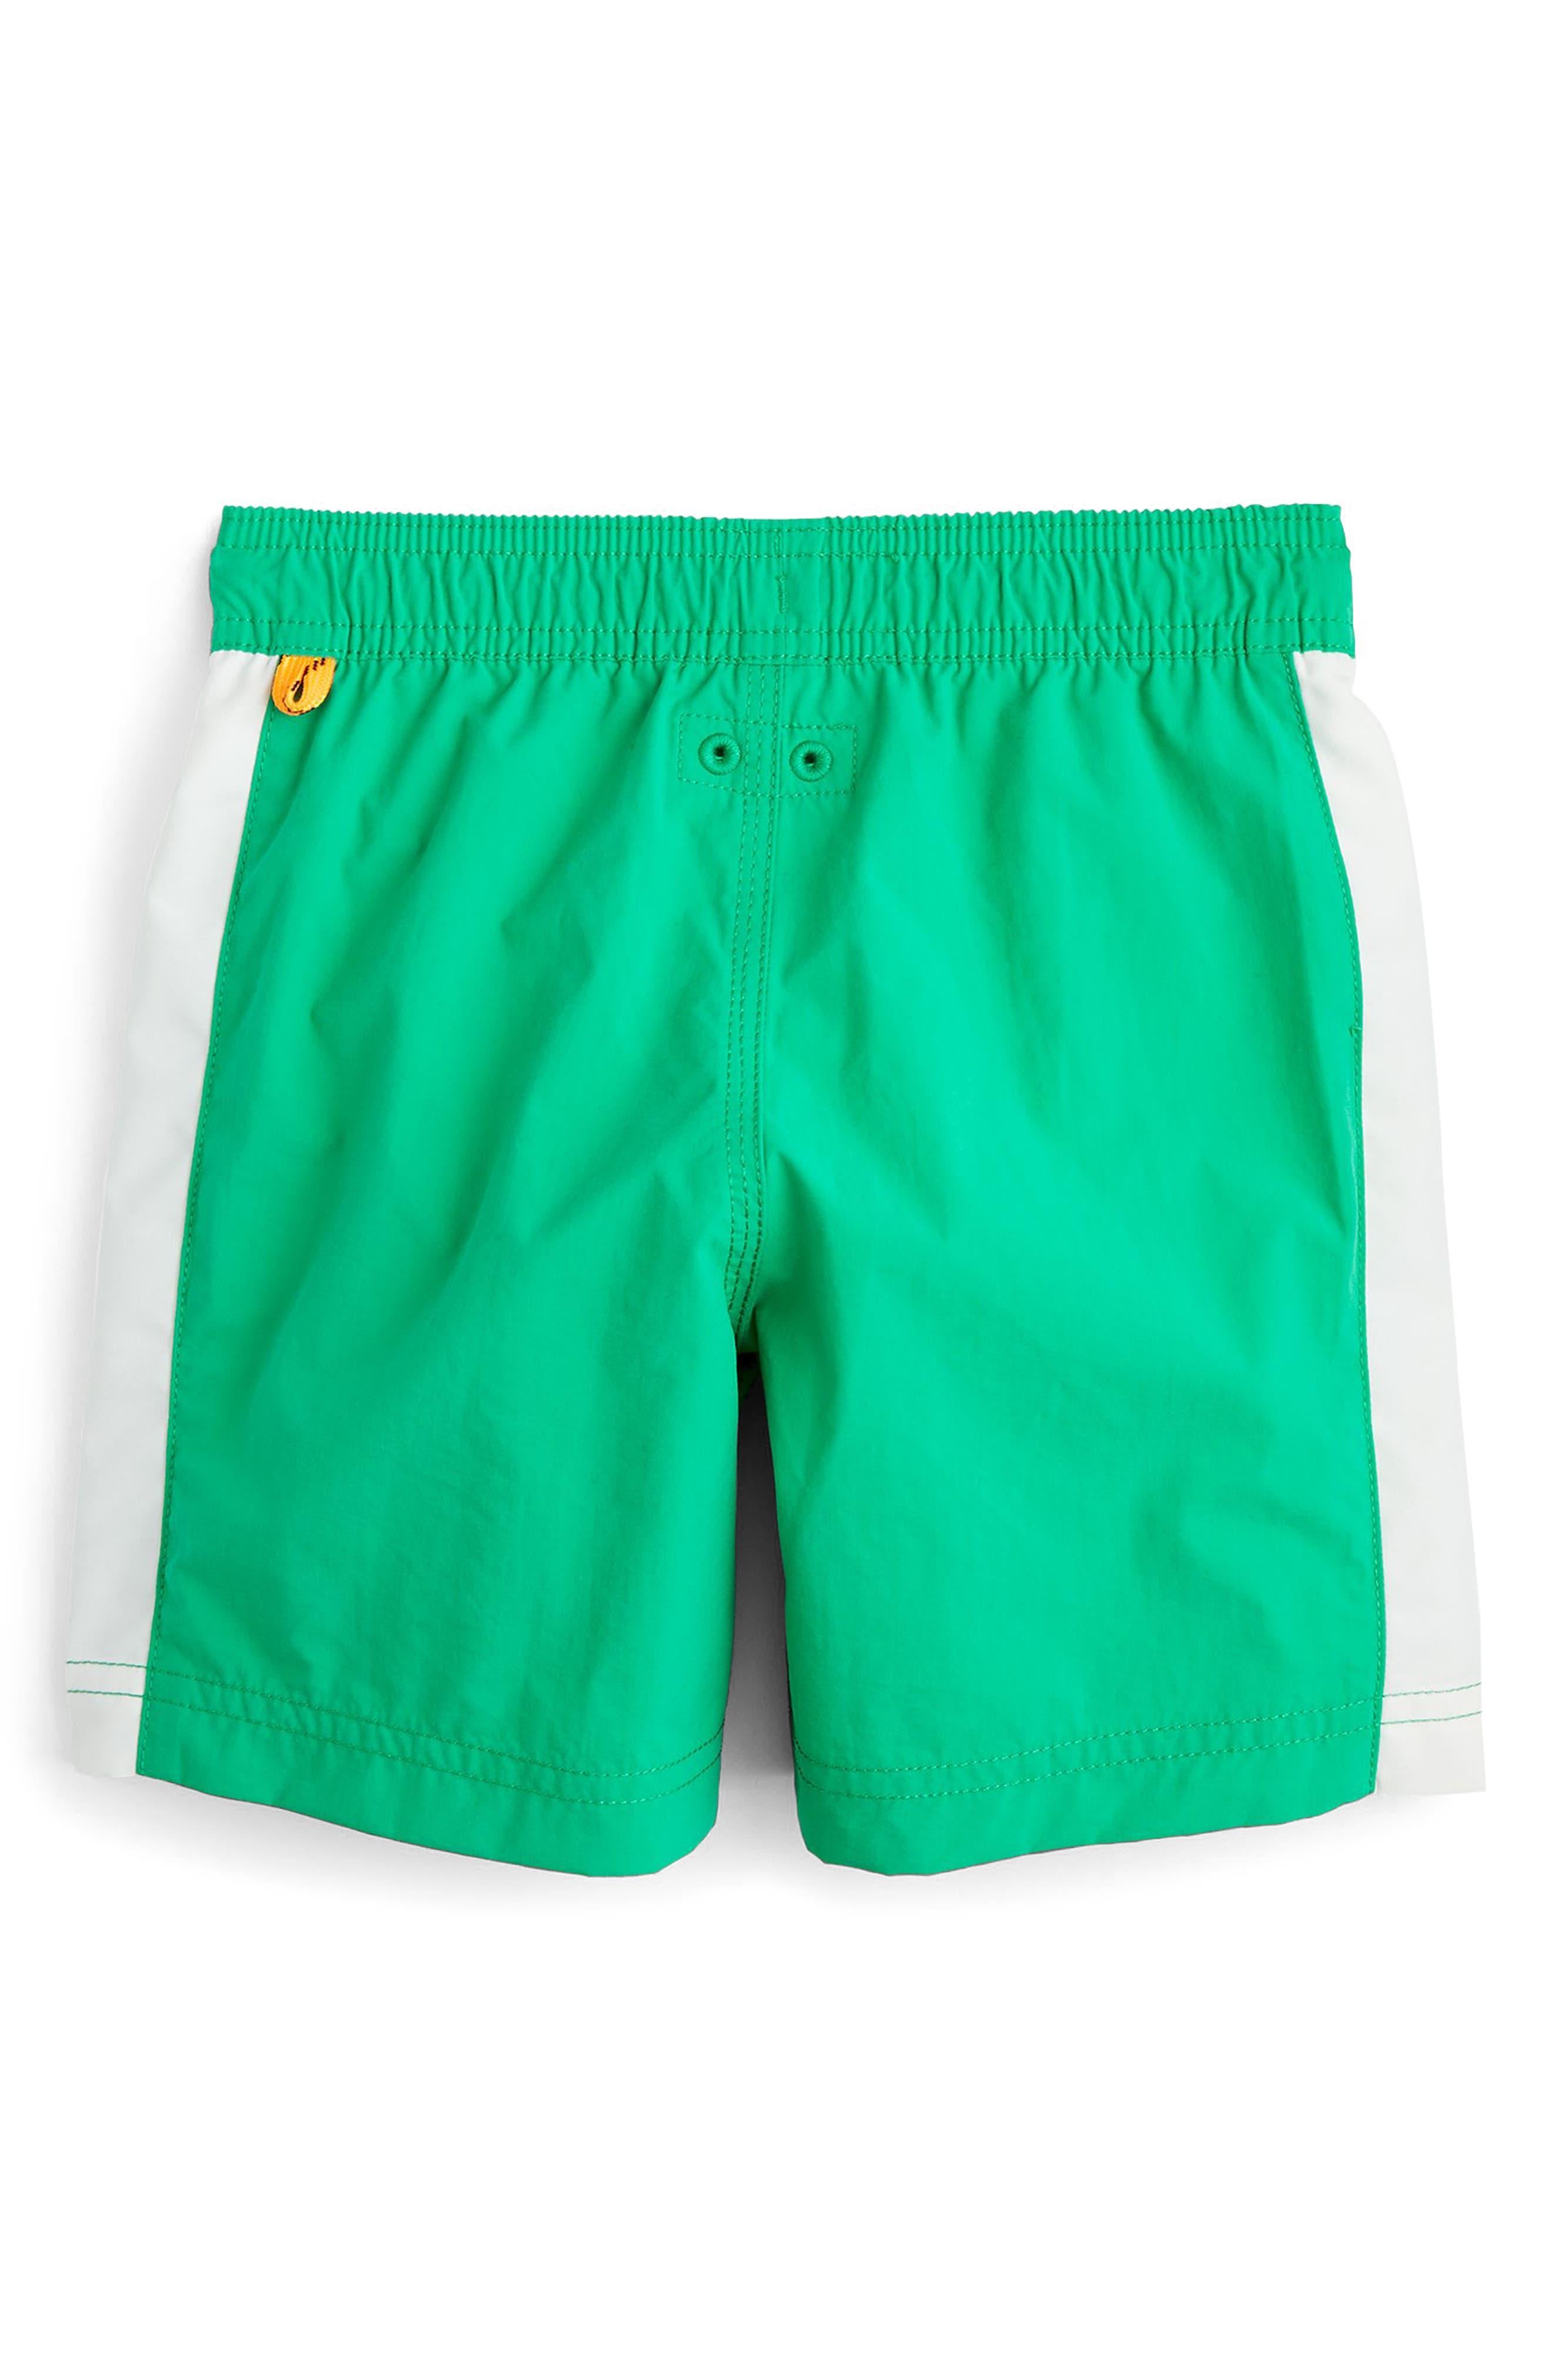 Colorblock Swim Trunks,                             Alternate thumbnail 2, color,                             Emerald White